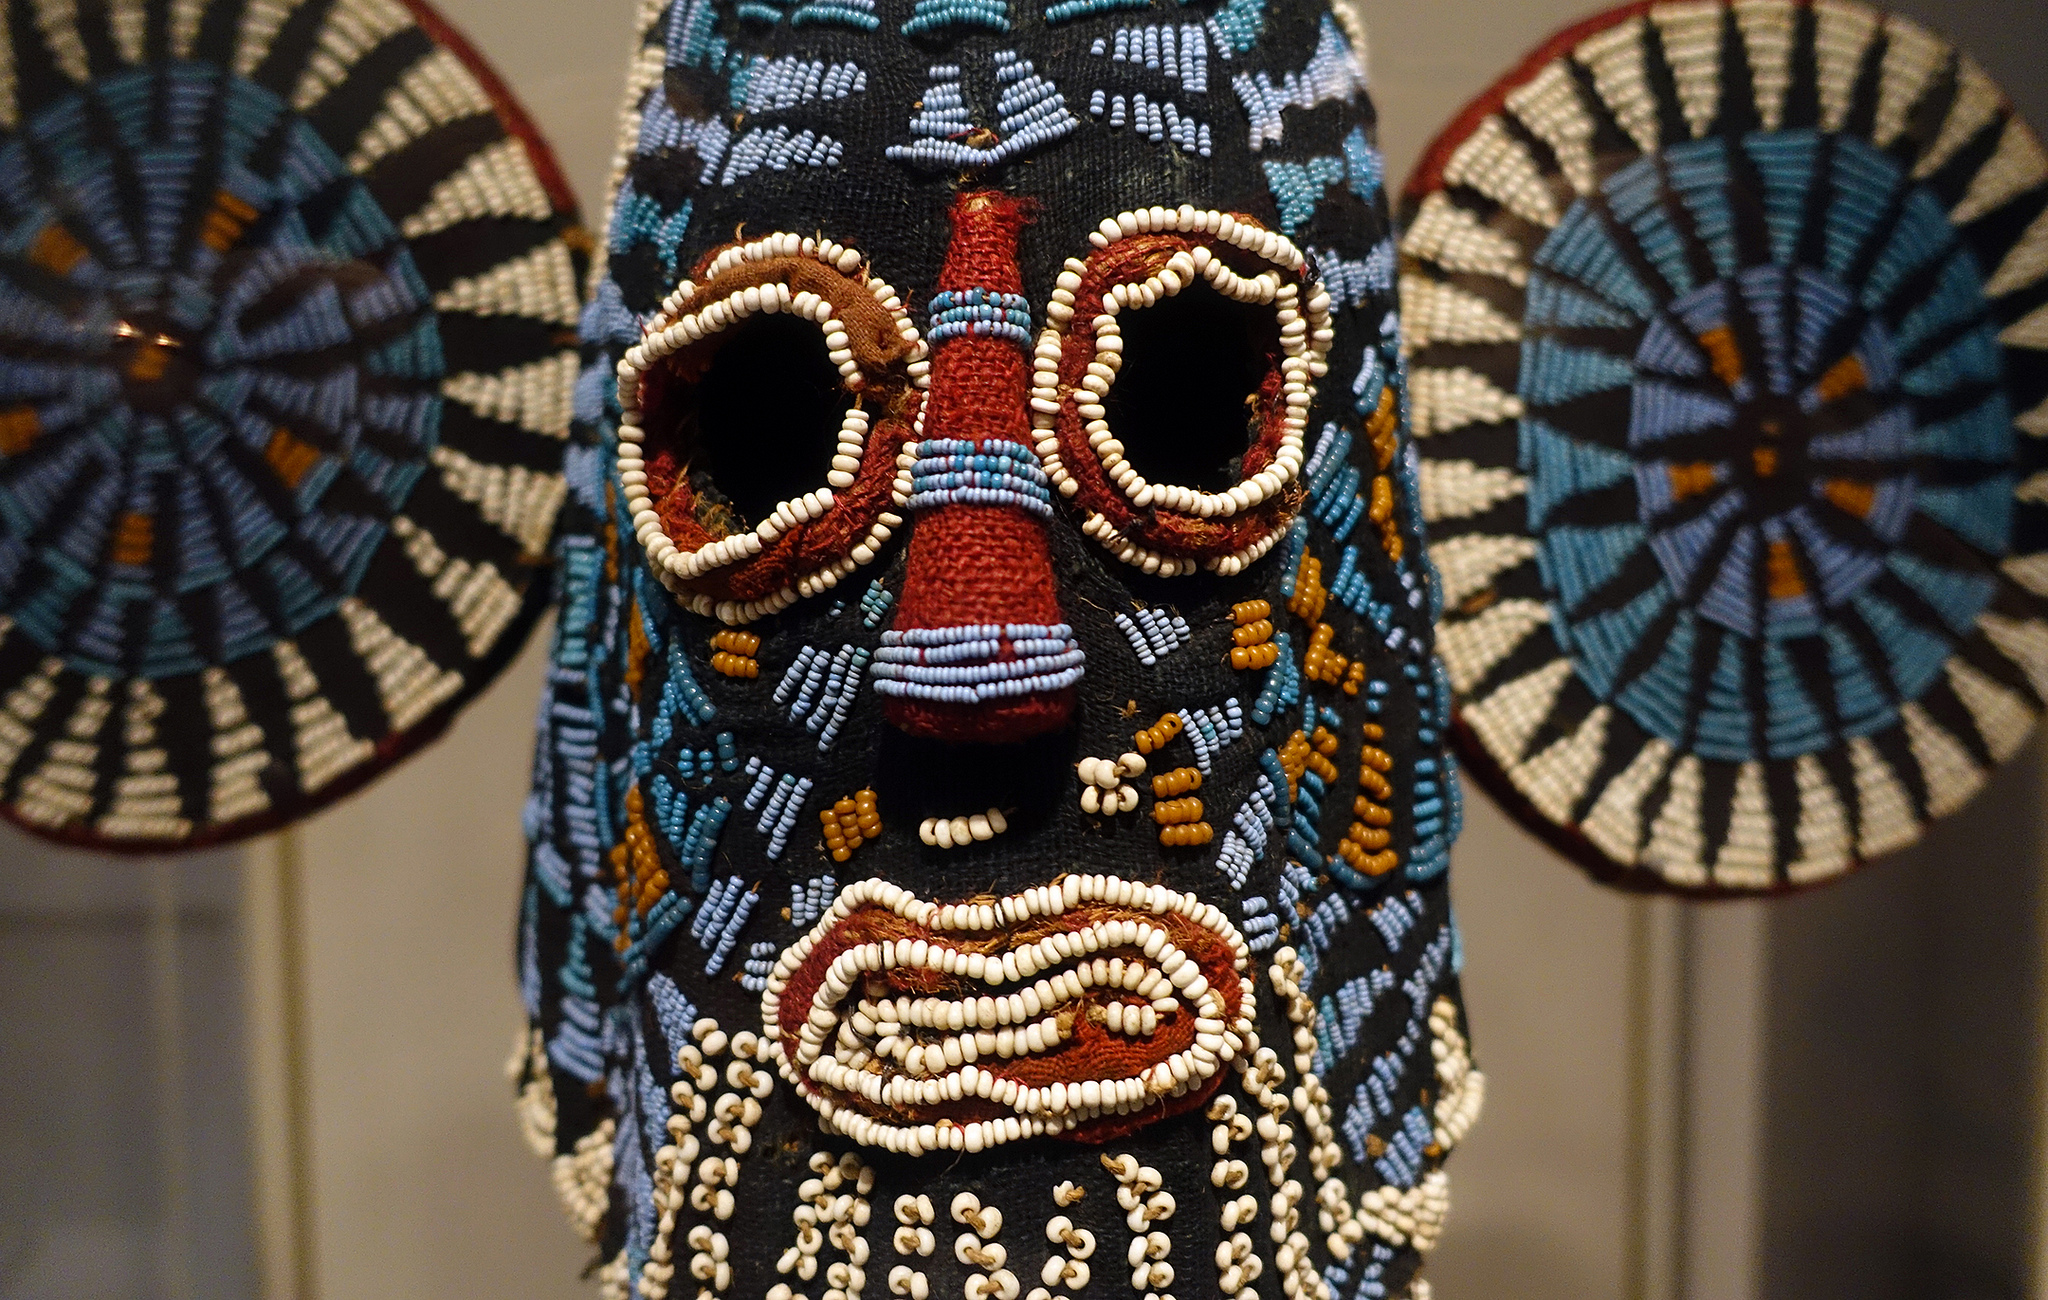 Elephant (Aka) Mask, Kuosi Society, Bamileke Peoples, Grassfields region of Cameroon, 20th century, cloth, beads, raffia, fiber, 146.7 x 52.1 x 29.2 cm (Brooklyn Museum)